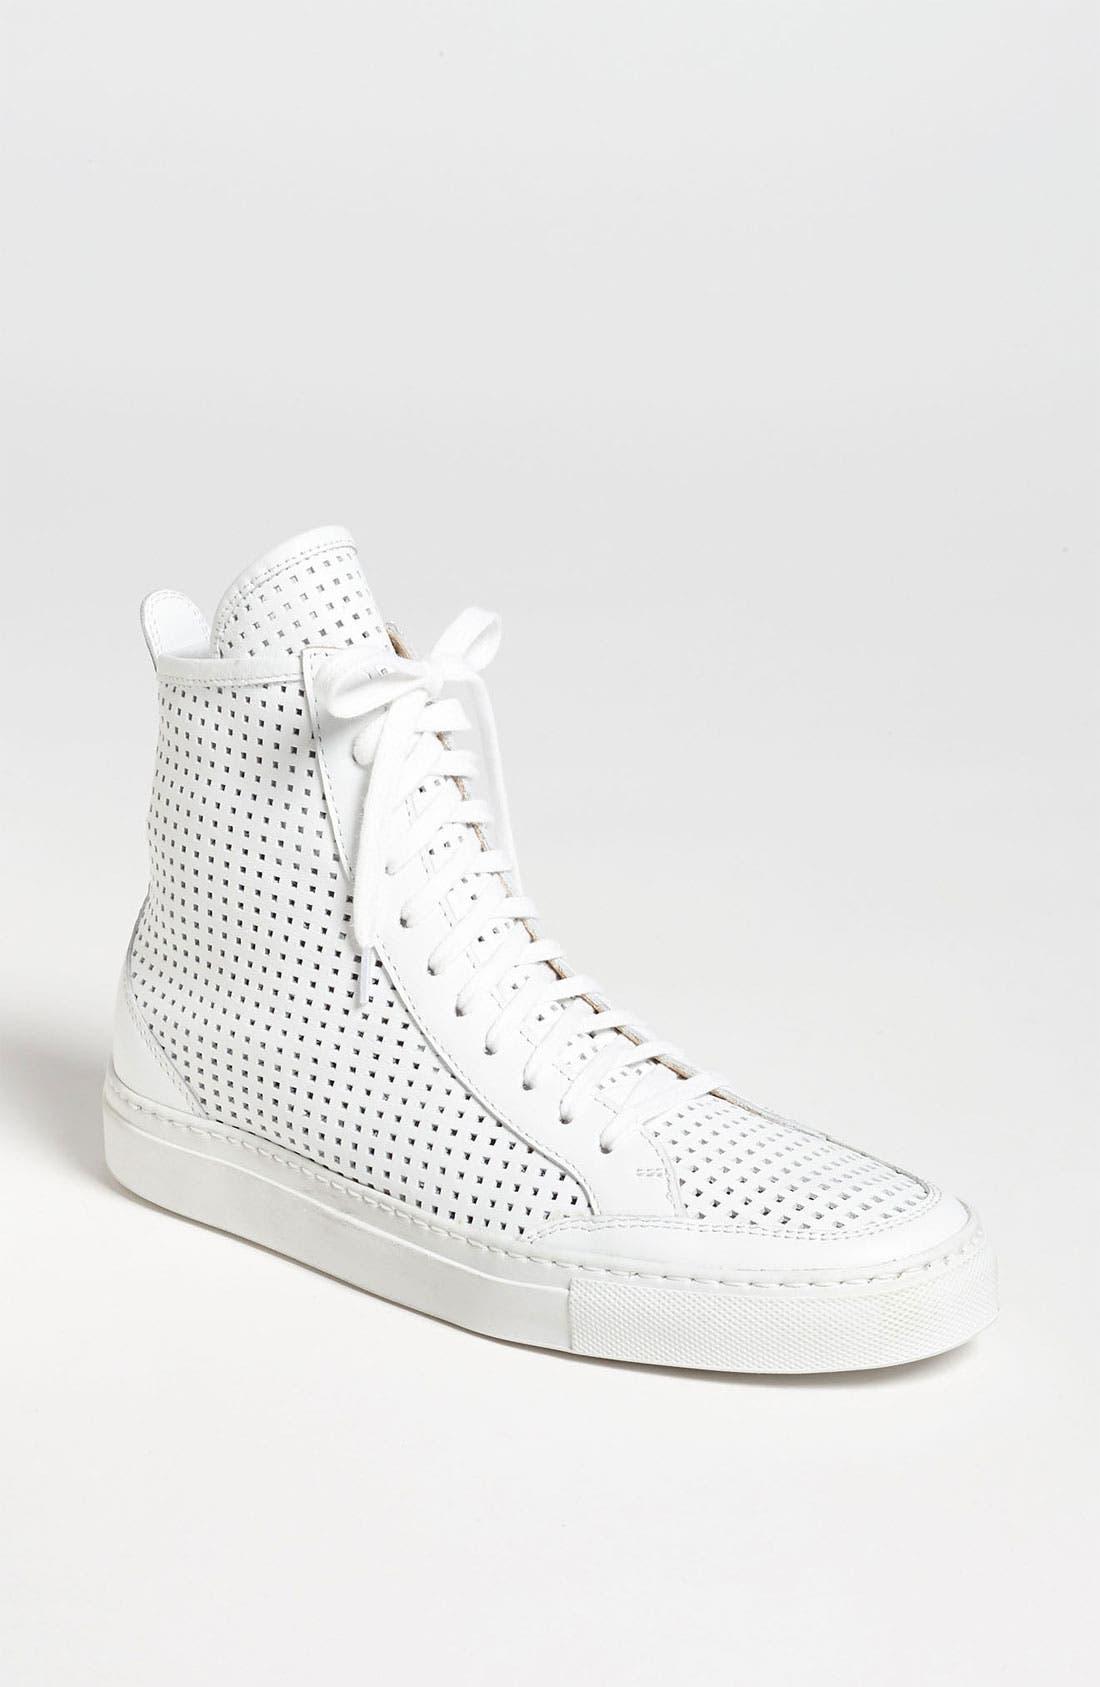 Alternate Image 1 Selected - MM6 Maison Margiela High Top Sneaker